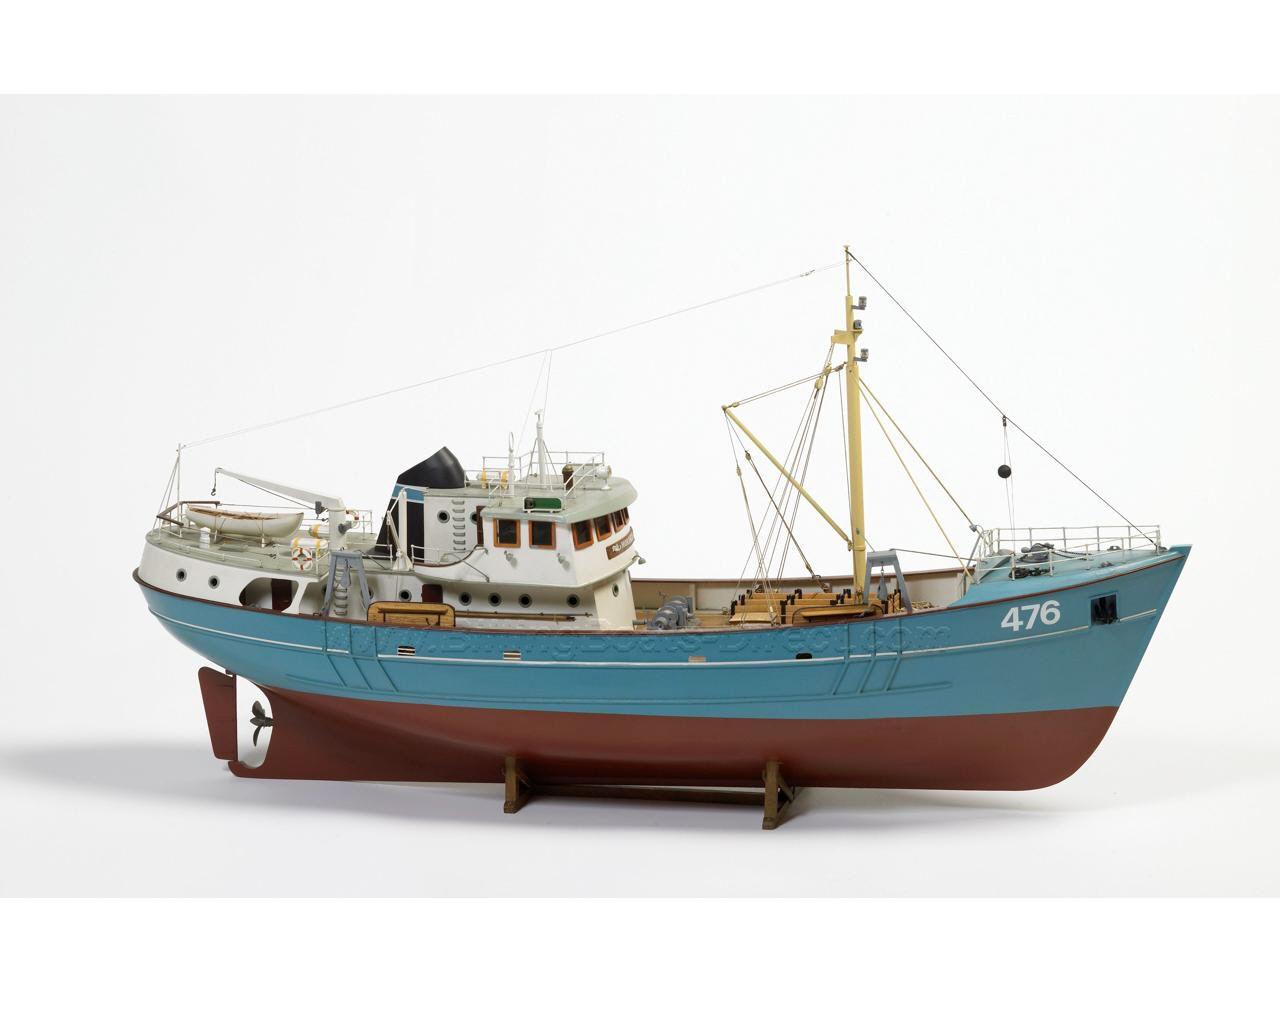 Nordkap Model Boat Kit - Billing Boats(B476)